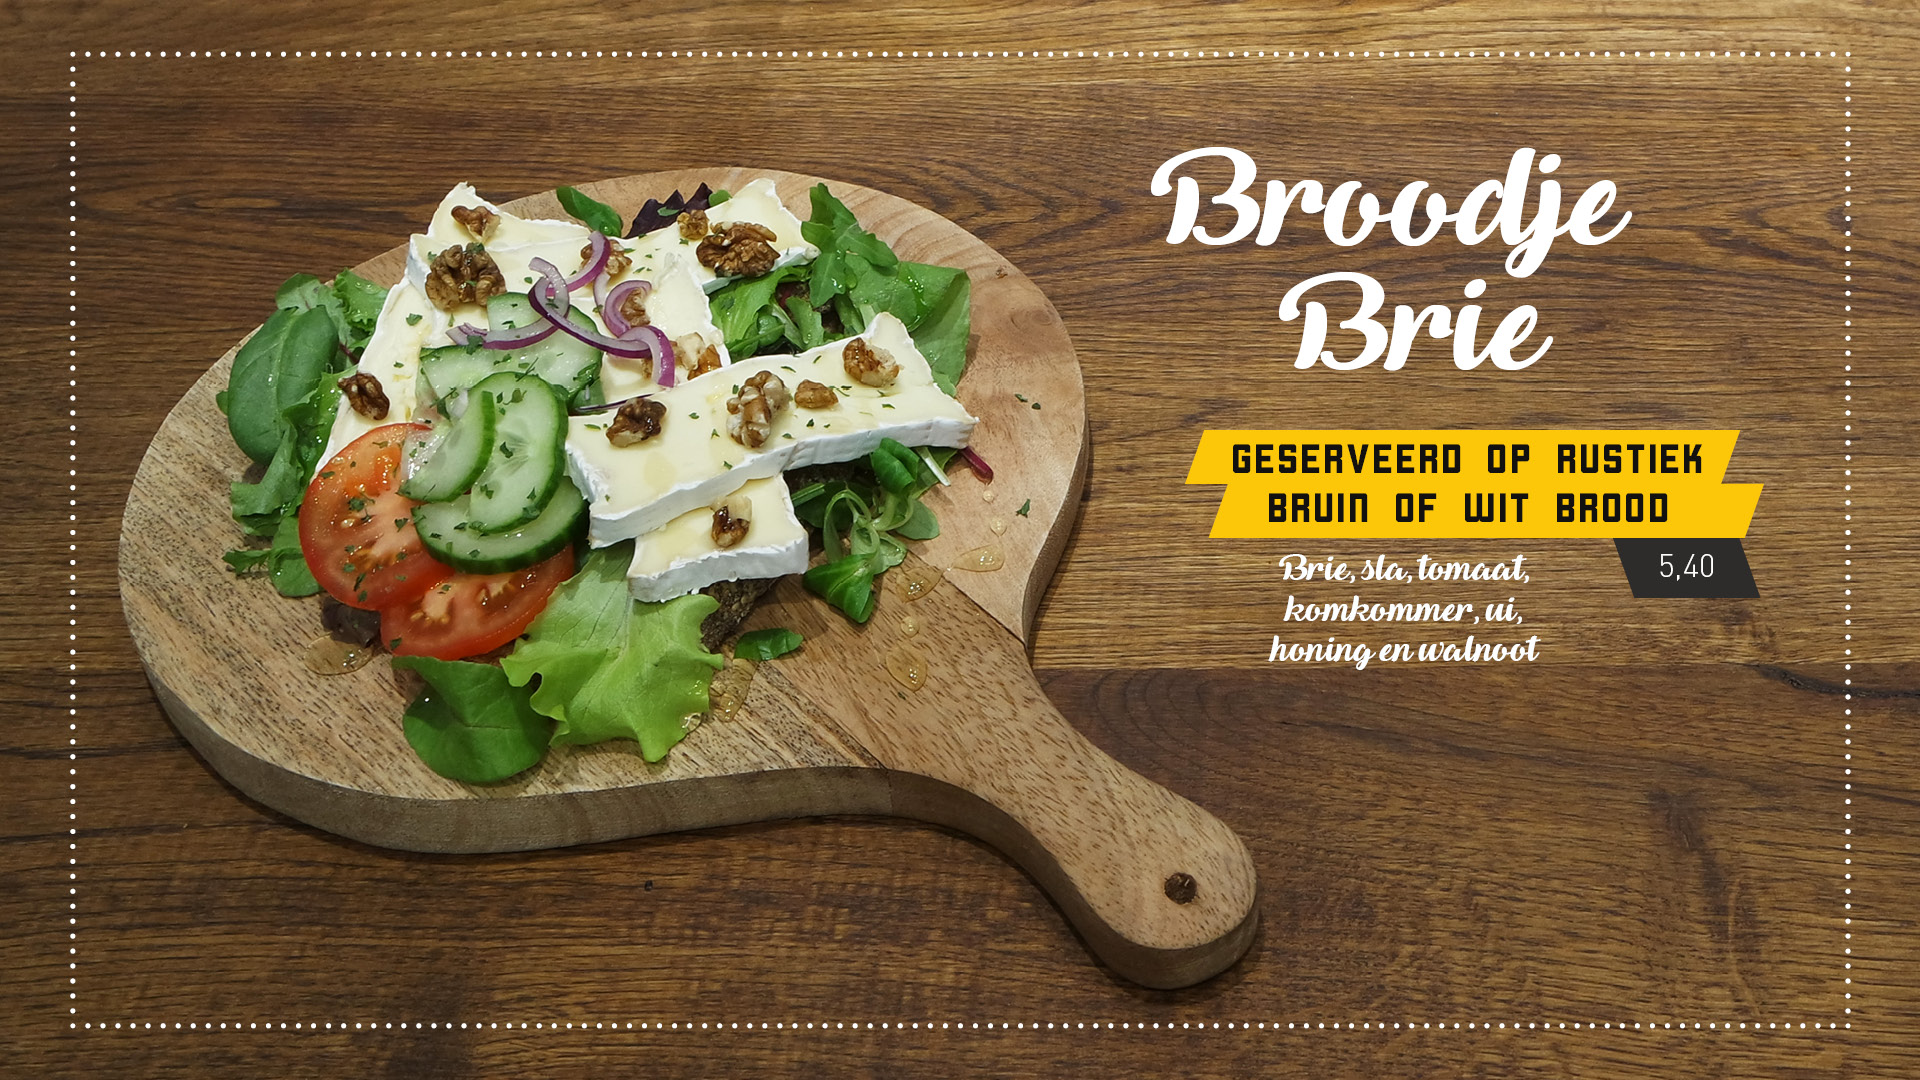 broodje-brie